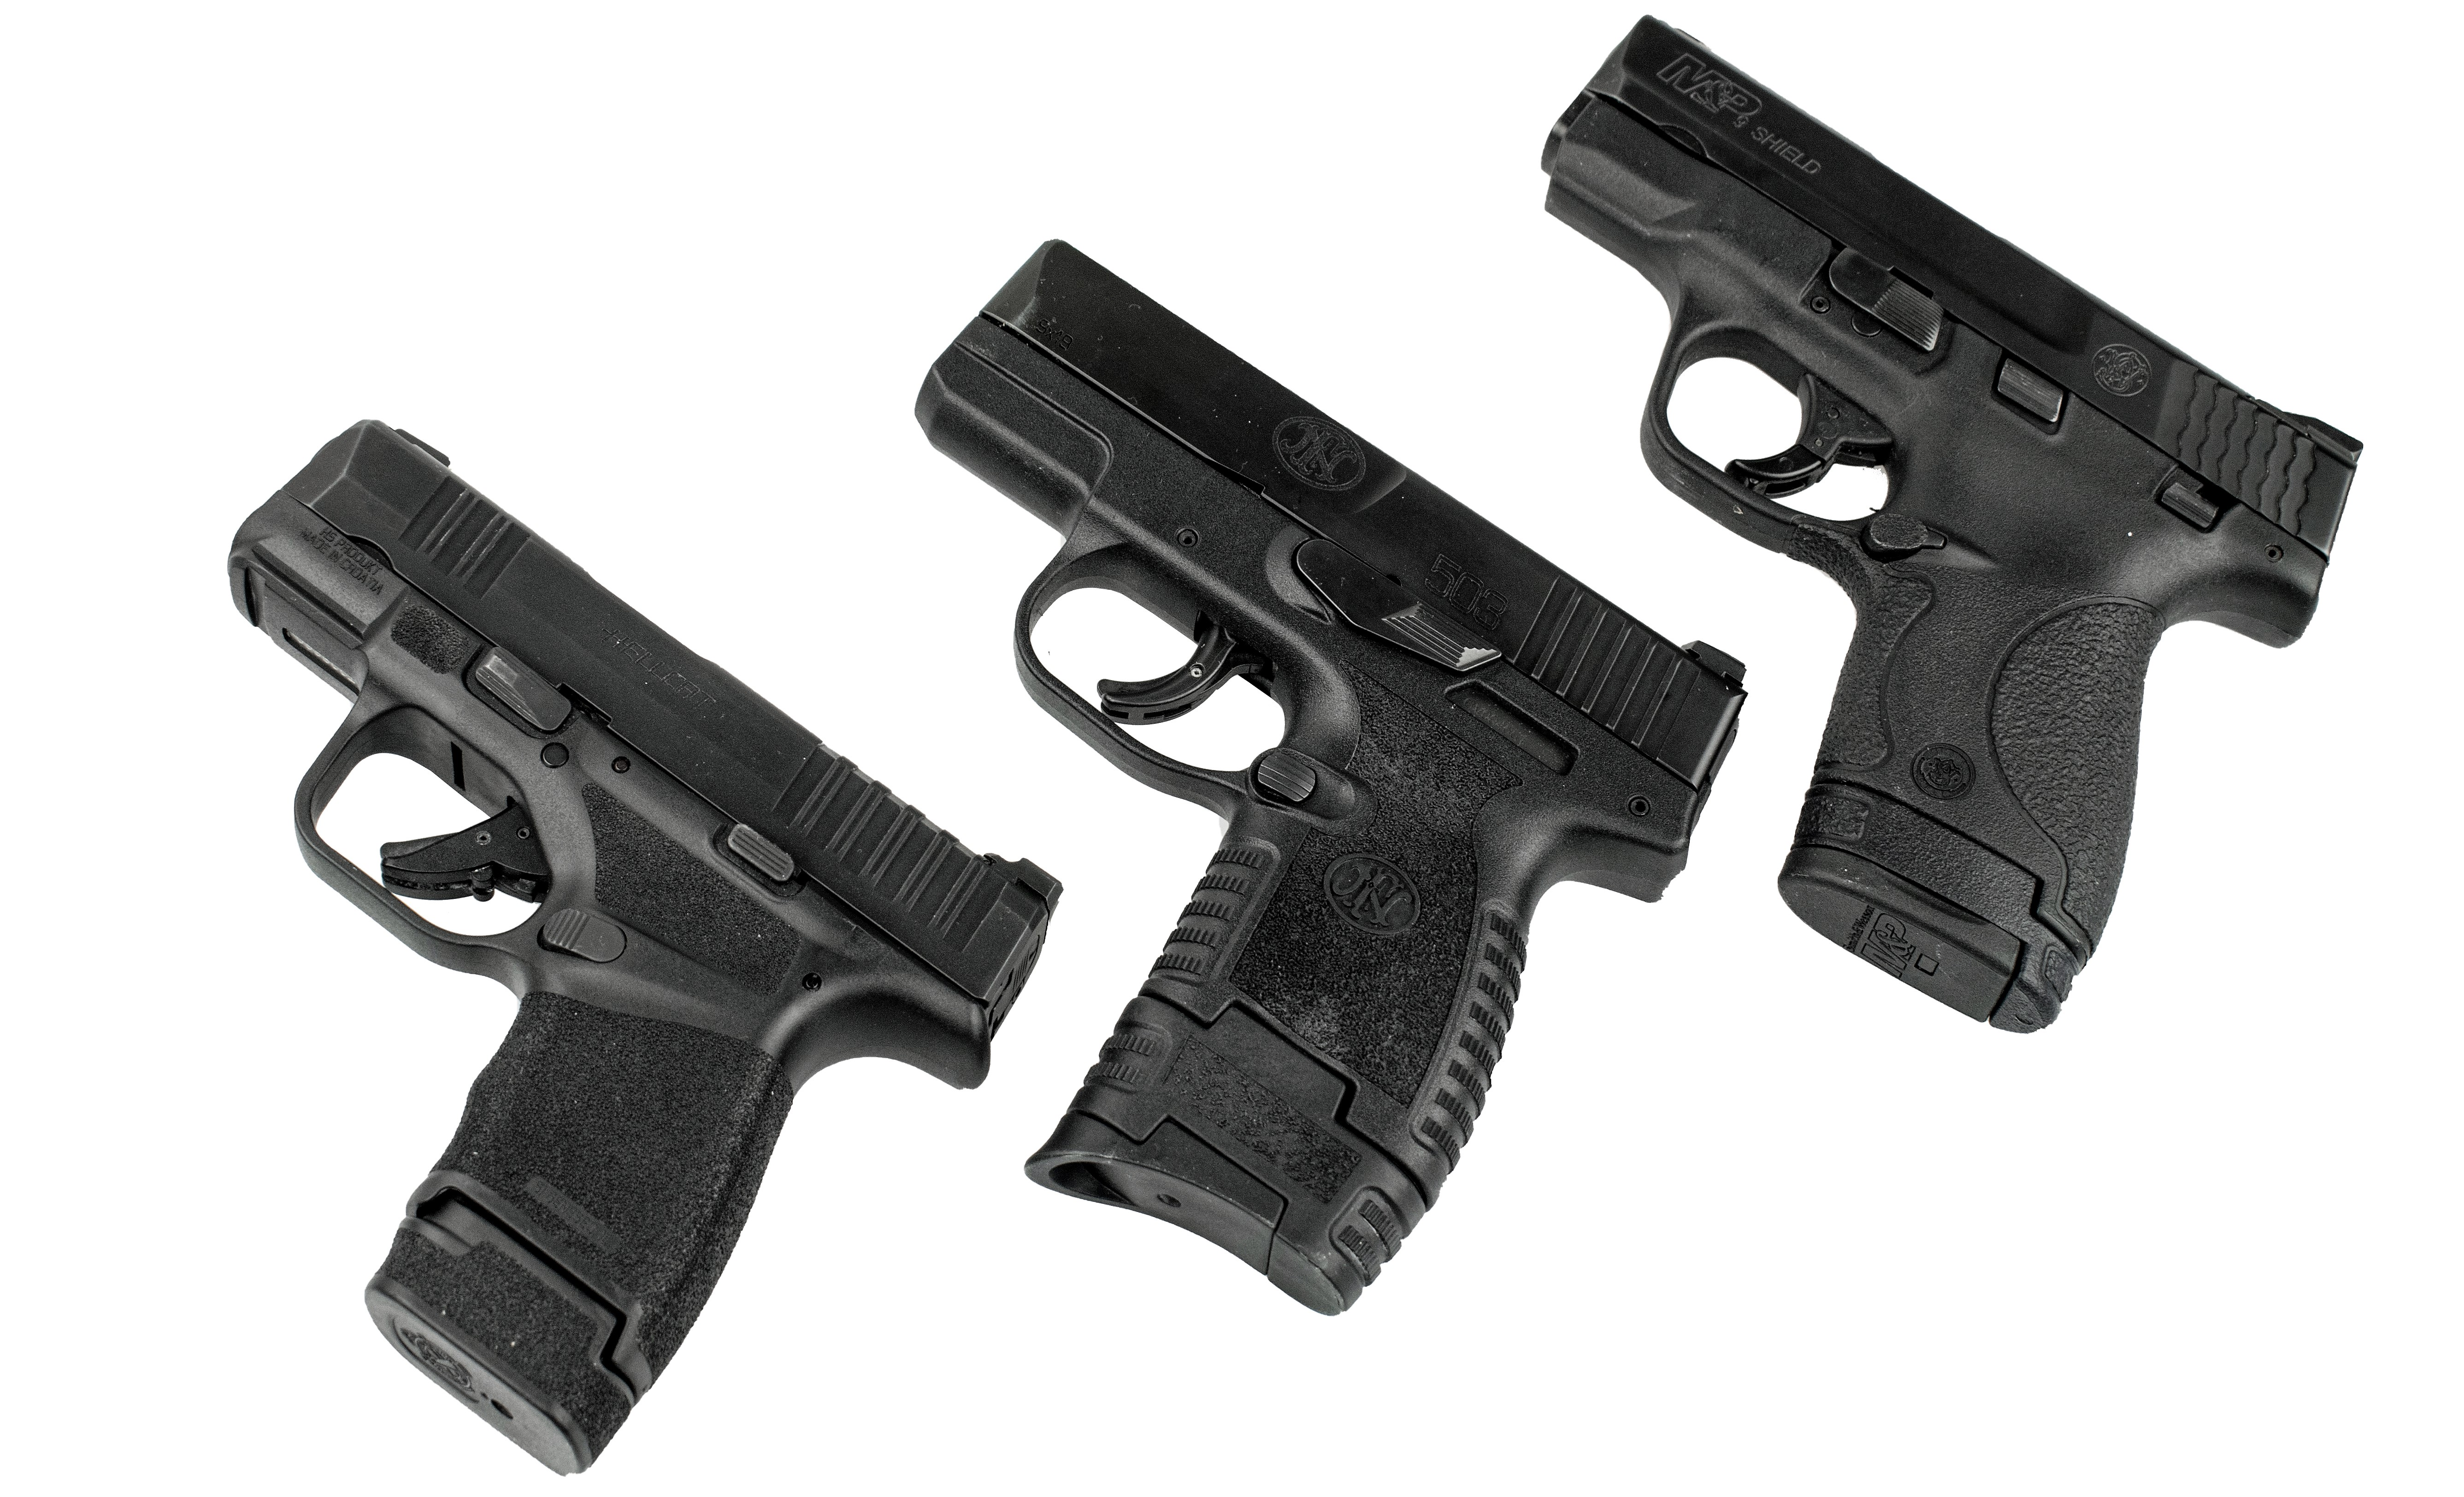 FN, FN 503, 9mm, pistol, FN handgun, IWB, OWB, CrossBreed Holsters, best holster, hybrid holsters, concealed carry, FN 503 pistol, striker-fired, FN new gun, new handgun, SuperTuck, FN America, hybrid holster, best holster for concealed carry, best hybrid holster, FN holsters, holsters for FN 503, Springfield Hellcat, Smith & Wesson Shield, Shield, Hellcat, 503, comparing handguns, handguns for concealed carry, concealed carry guns, Springfield Armory, Smith & Wesson